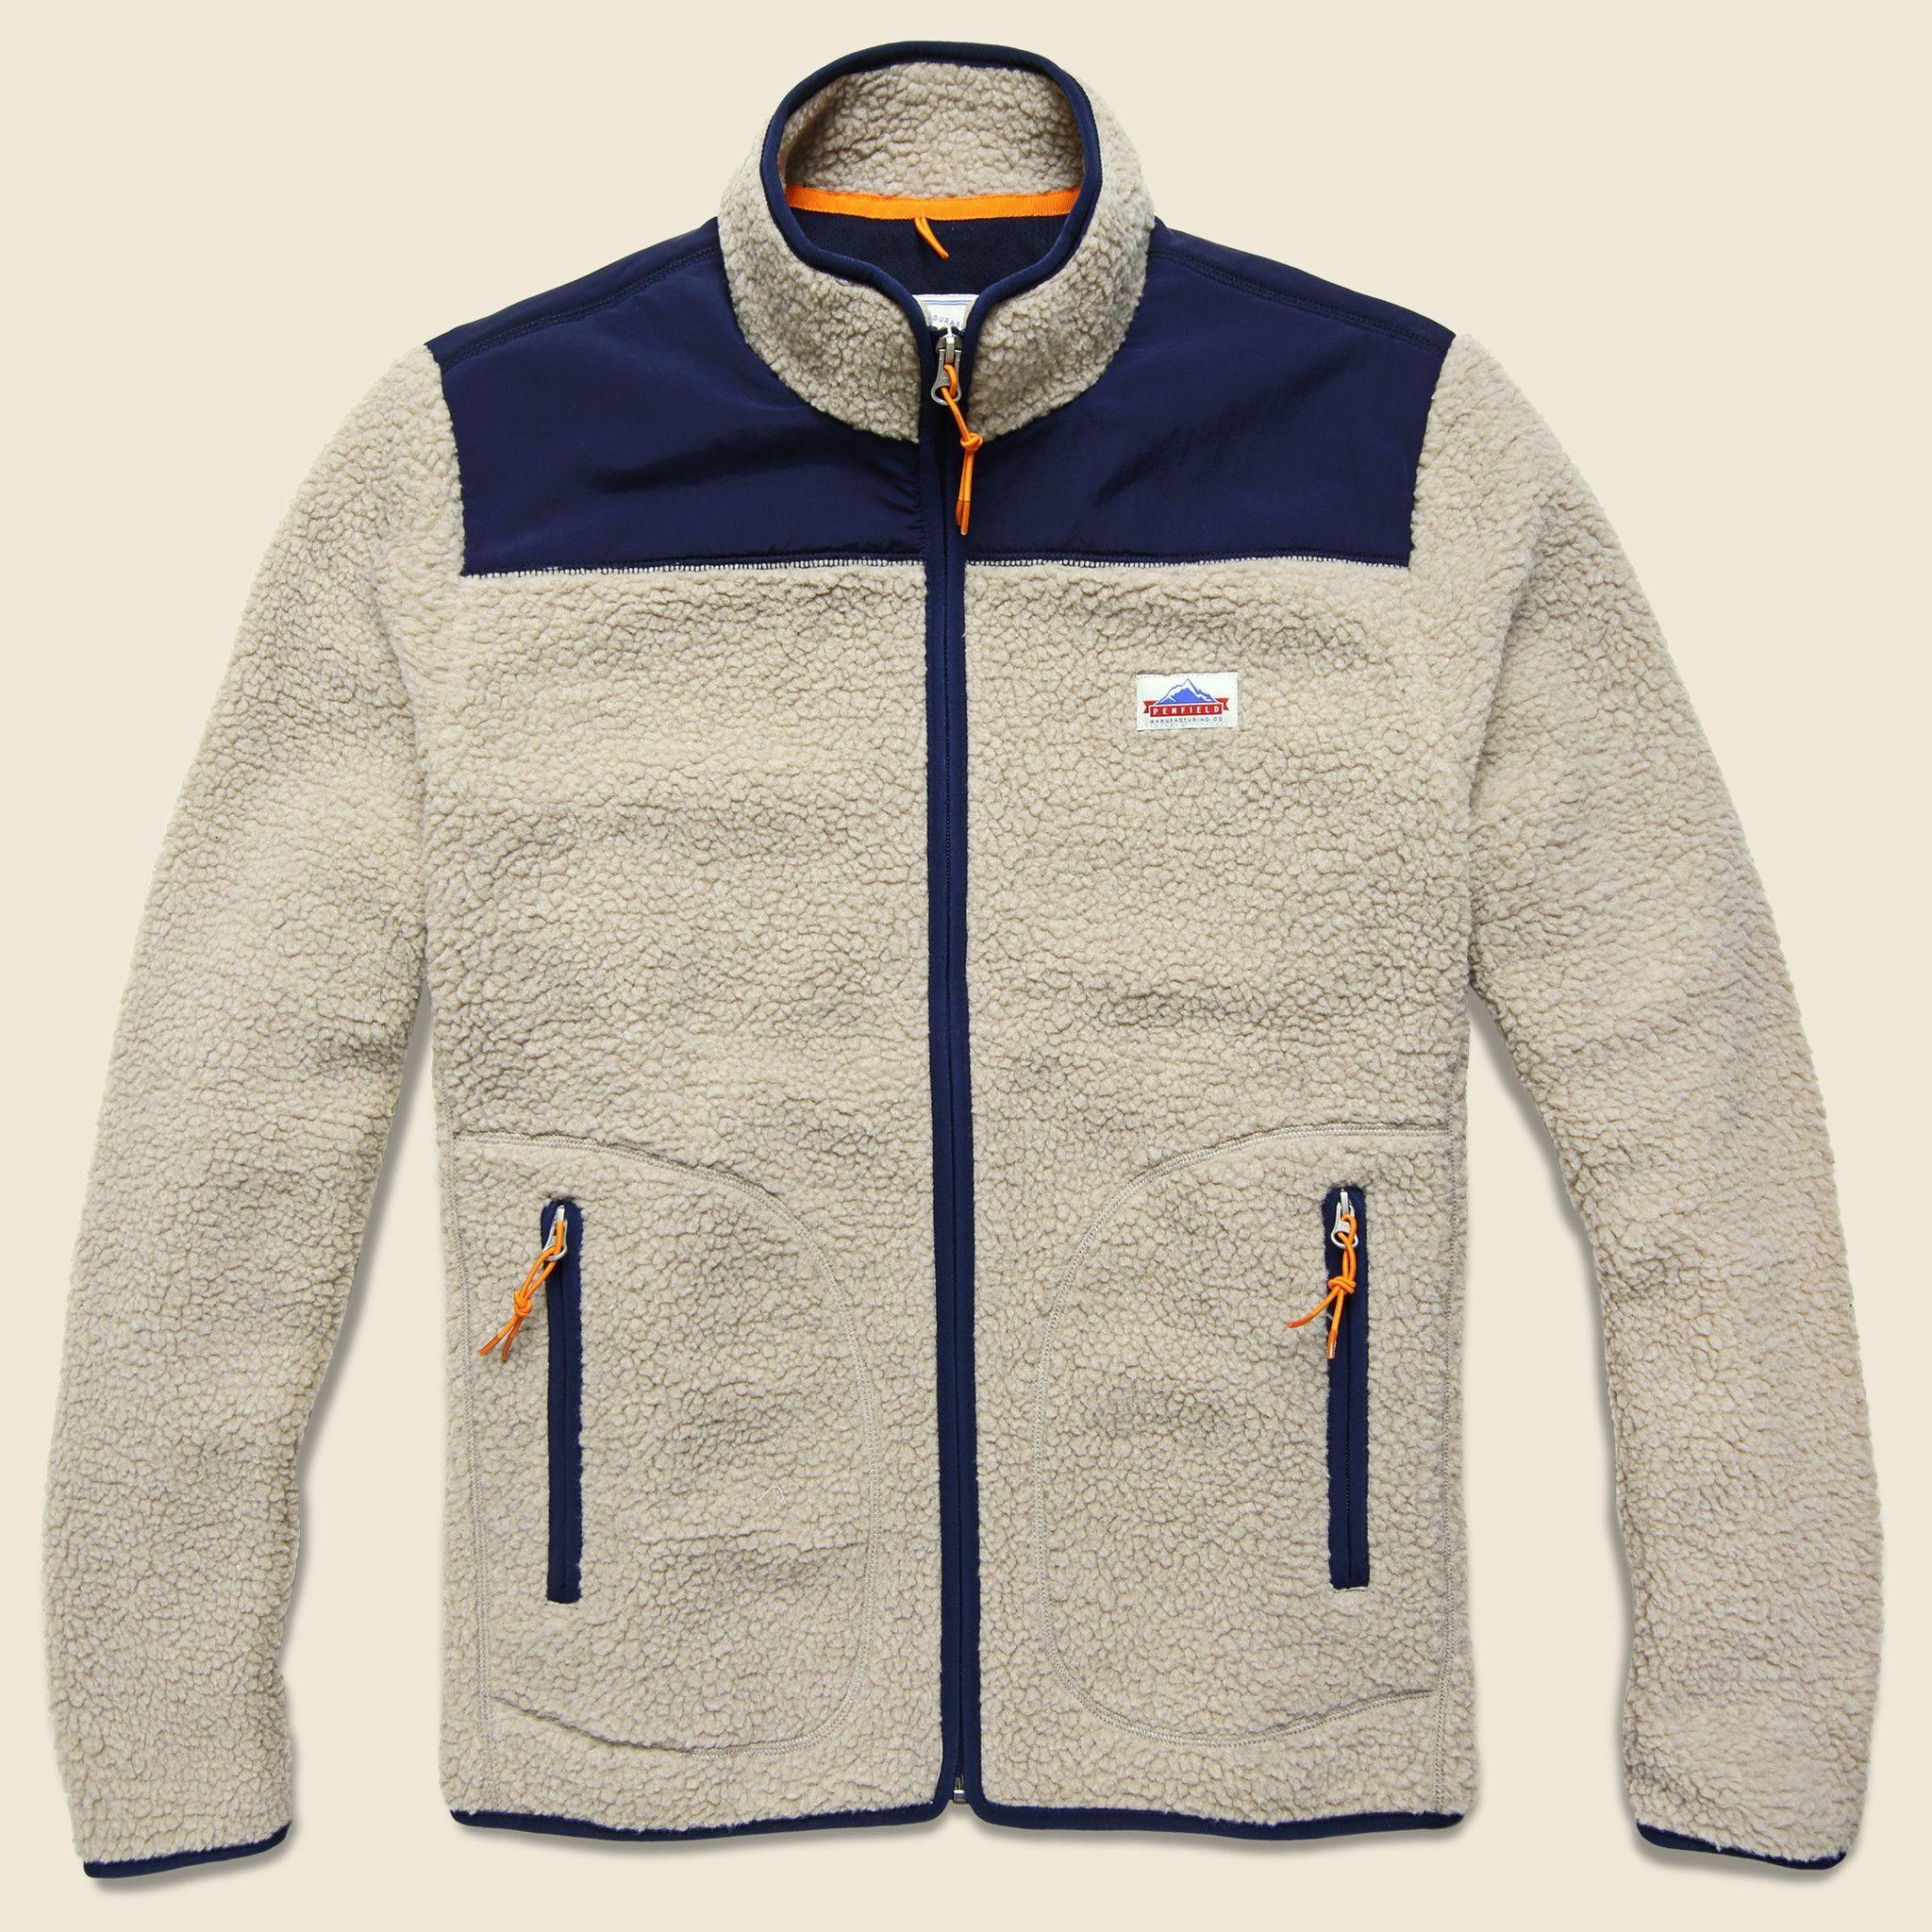 Mattawa fleece jacket tan products pinterest products